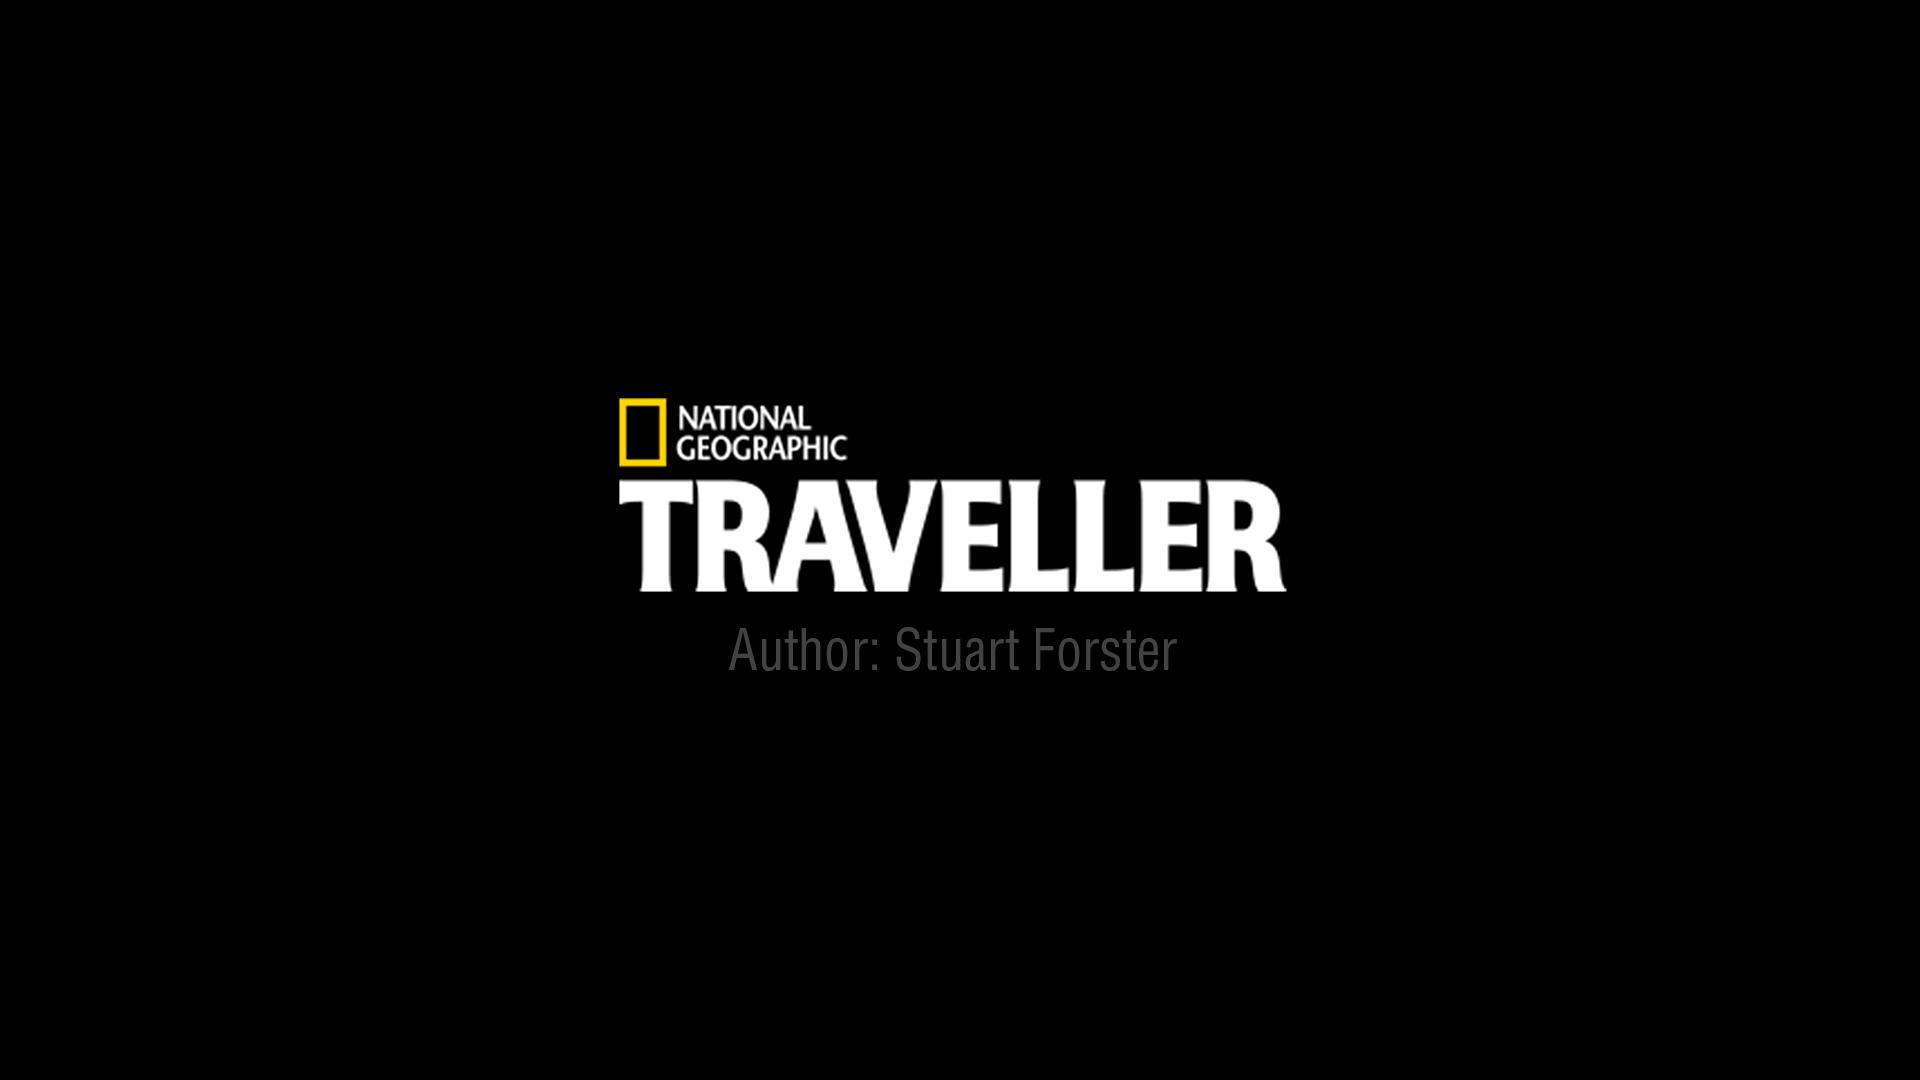 NatGeo Traveller logo - Bandos